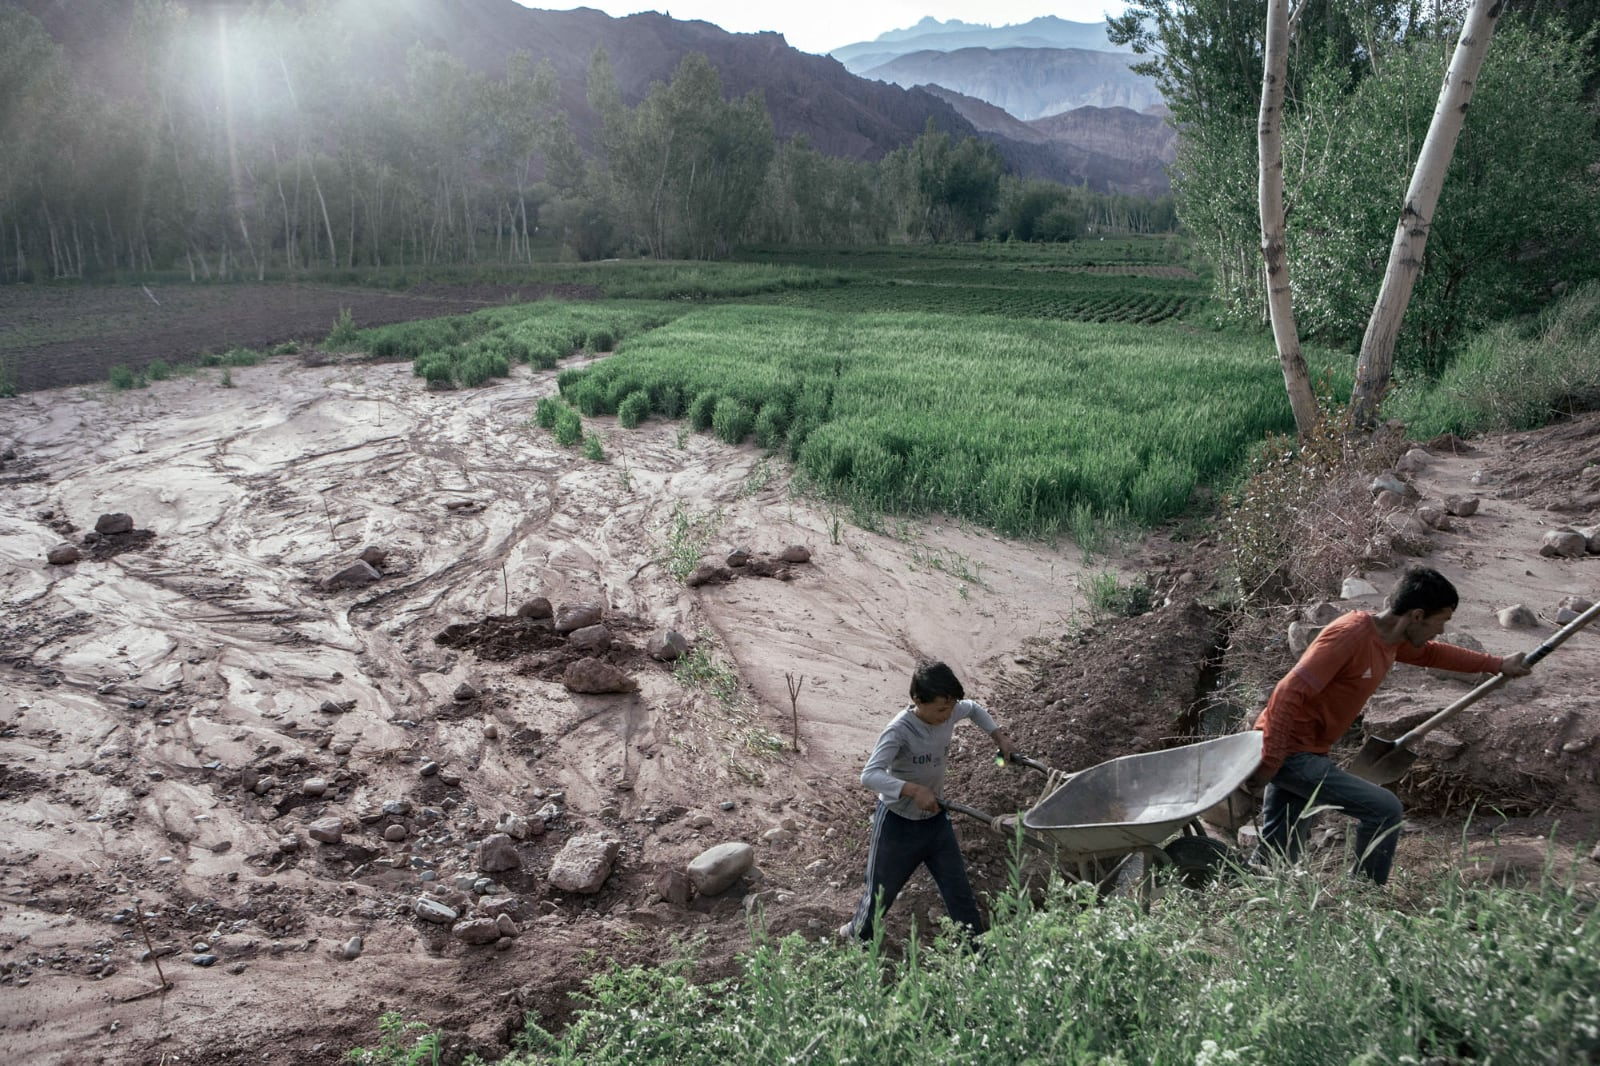 Eervolle vermelding SPoTY 2020 Climate change in Afghanistan door Solmaz Daryani